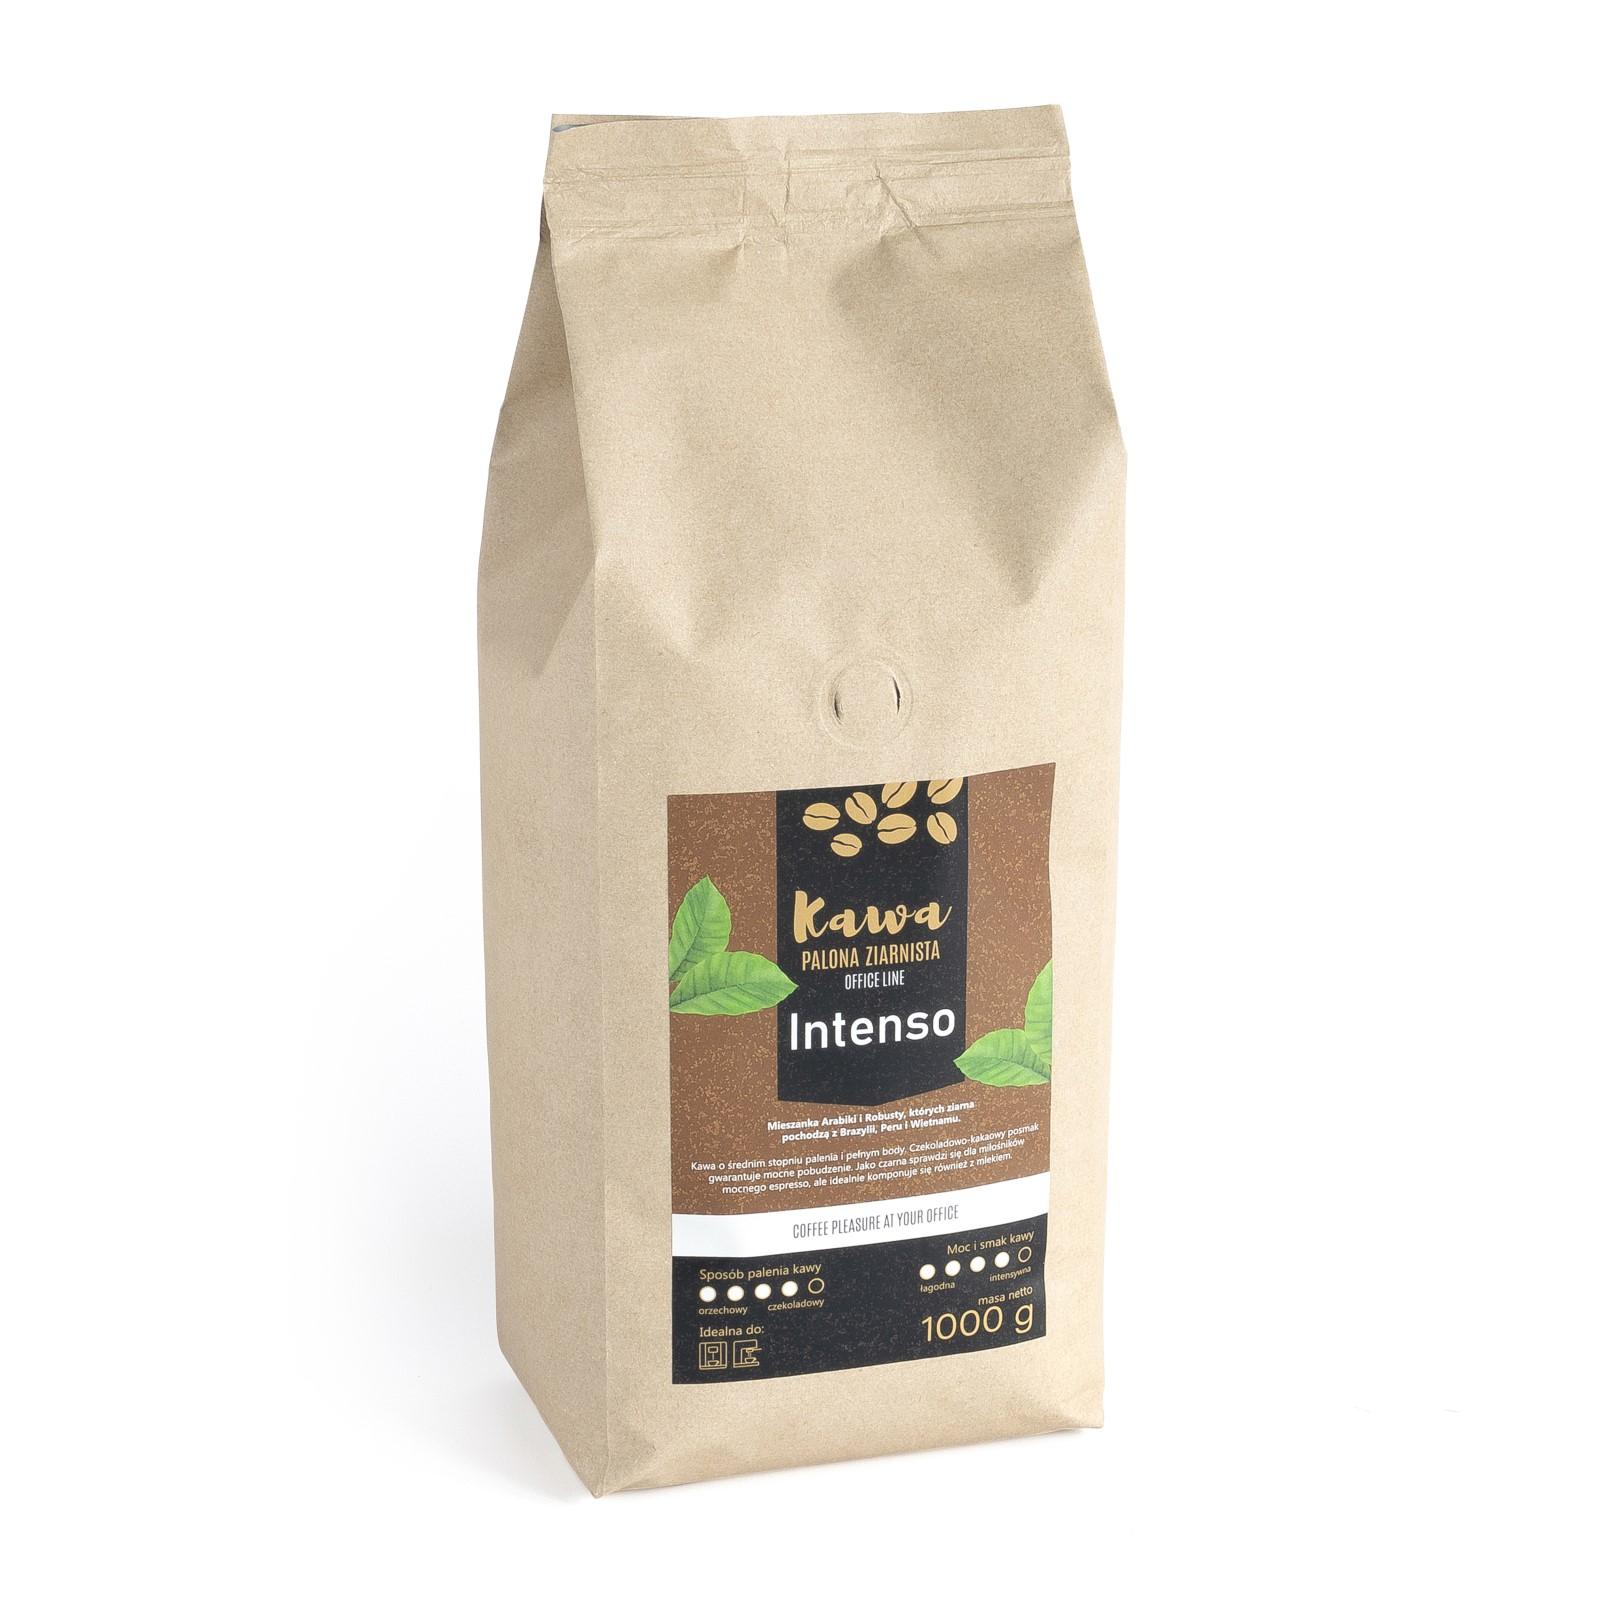 Segafredo Intenso 1000 g Coffee Beans